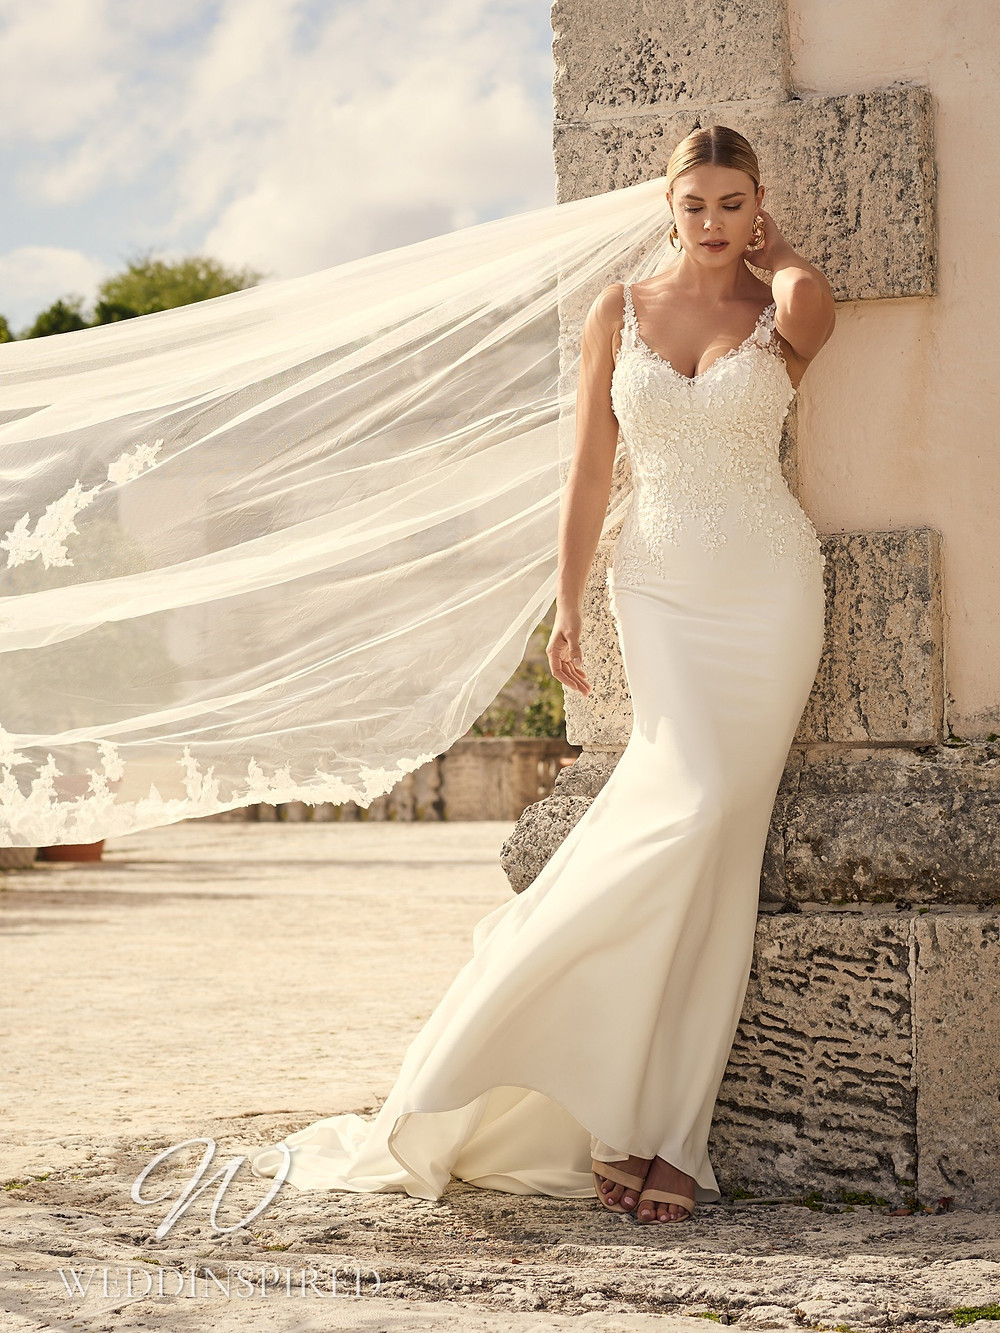 A Sottero & Midgley 2021 ivory lace and satin mermaid wedding dress